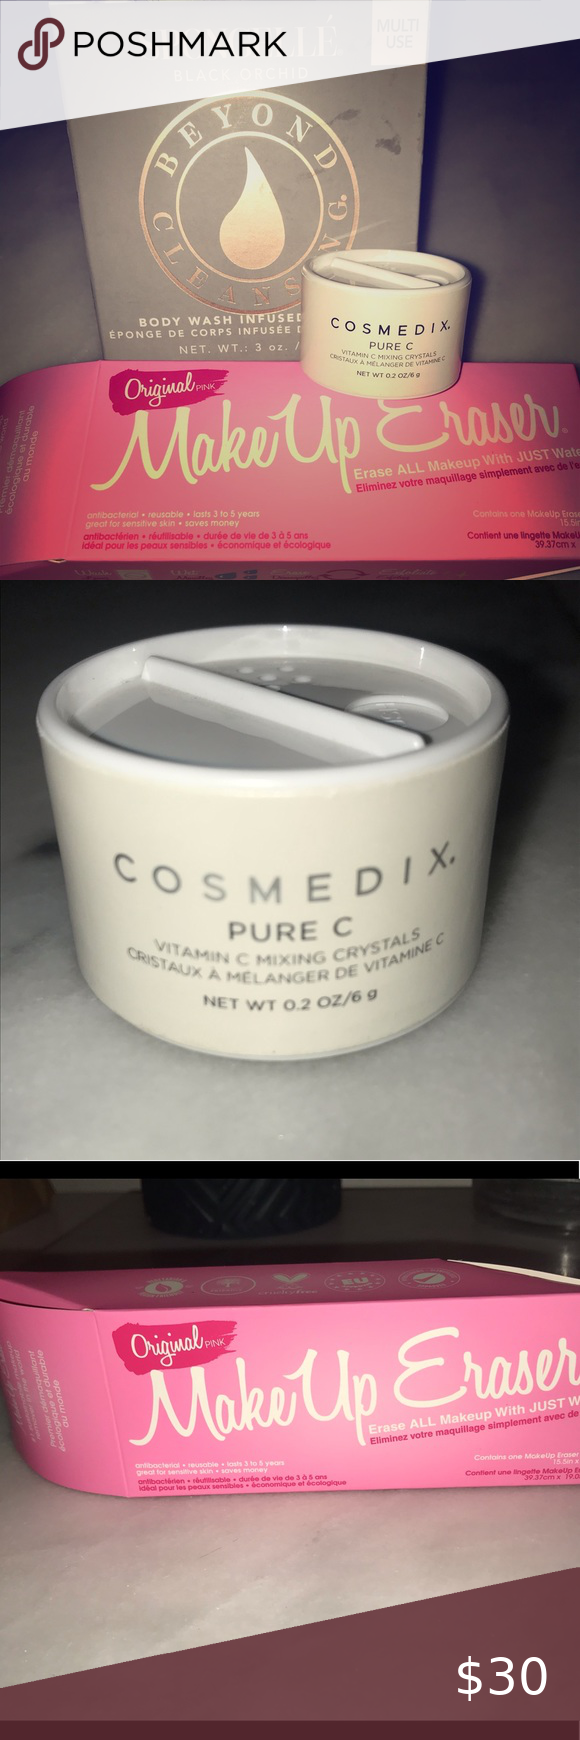 Beauty Bundle in 2020 Beauty bundle, Pure products, Make